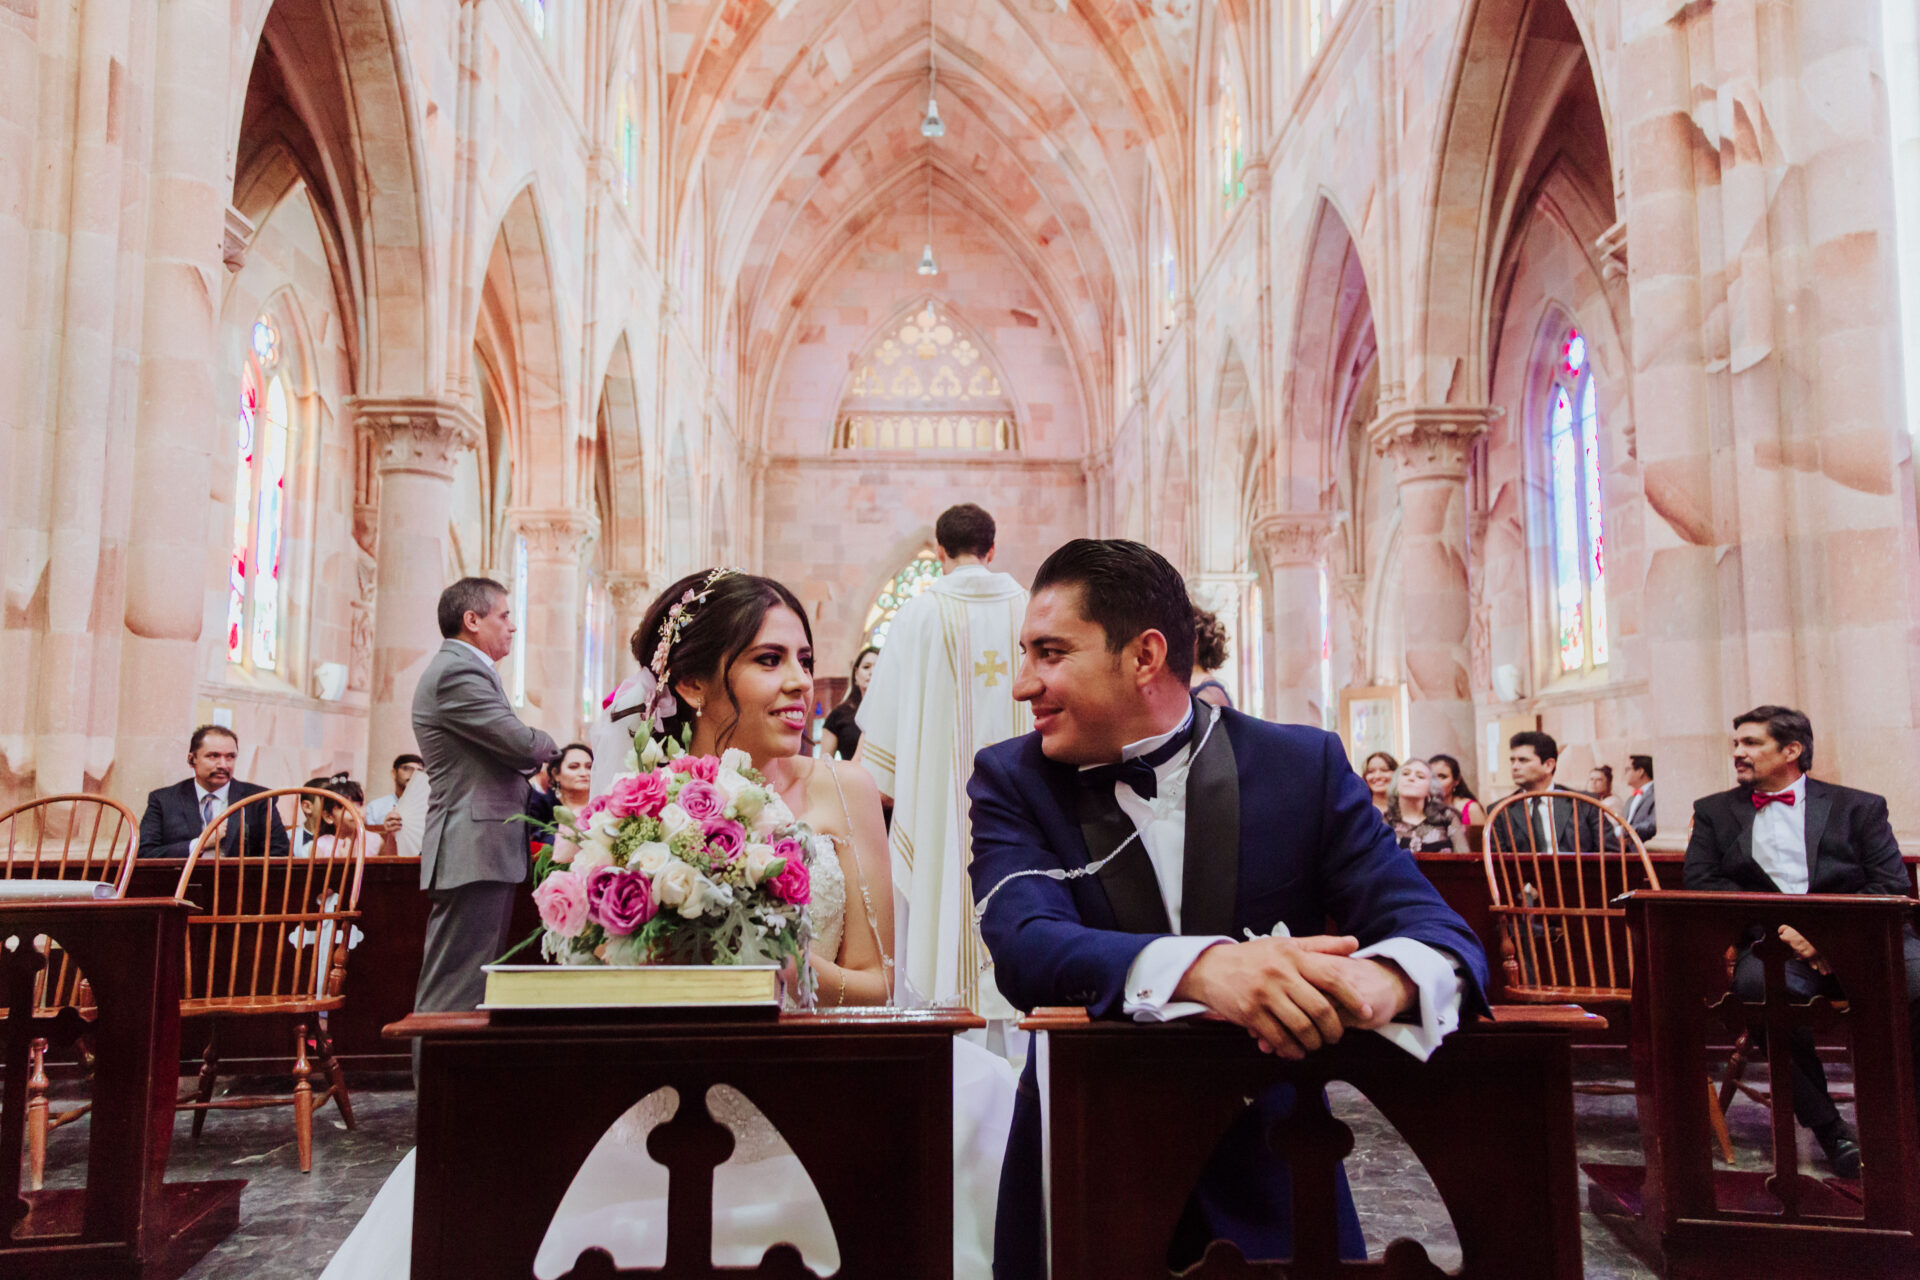 javier_noriega_fotografo_bodas_exhacienda_las_mercedes_zacatecas_wedding_photographer5a